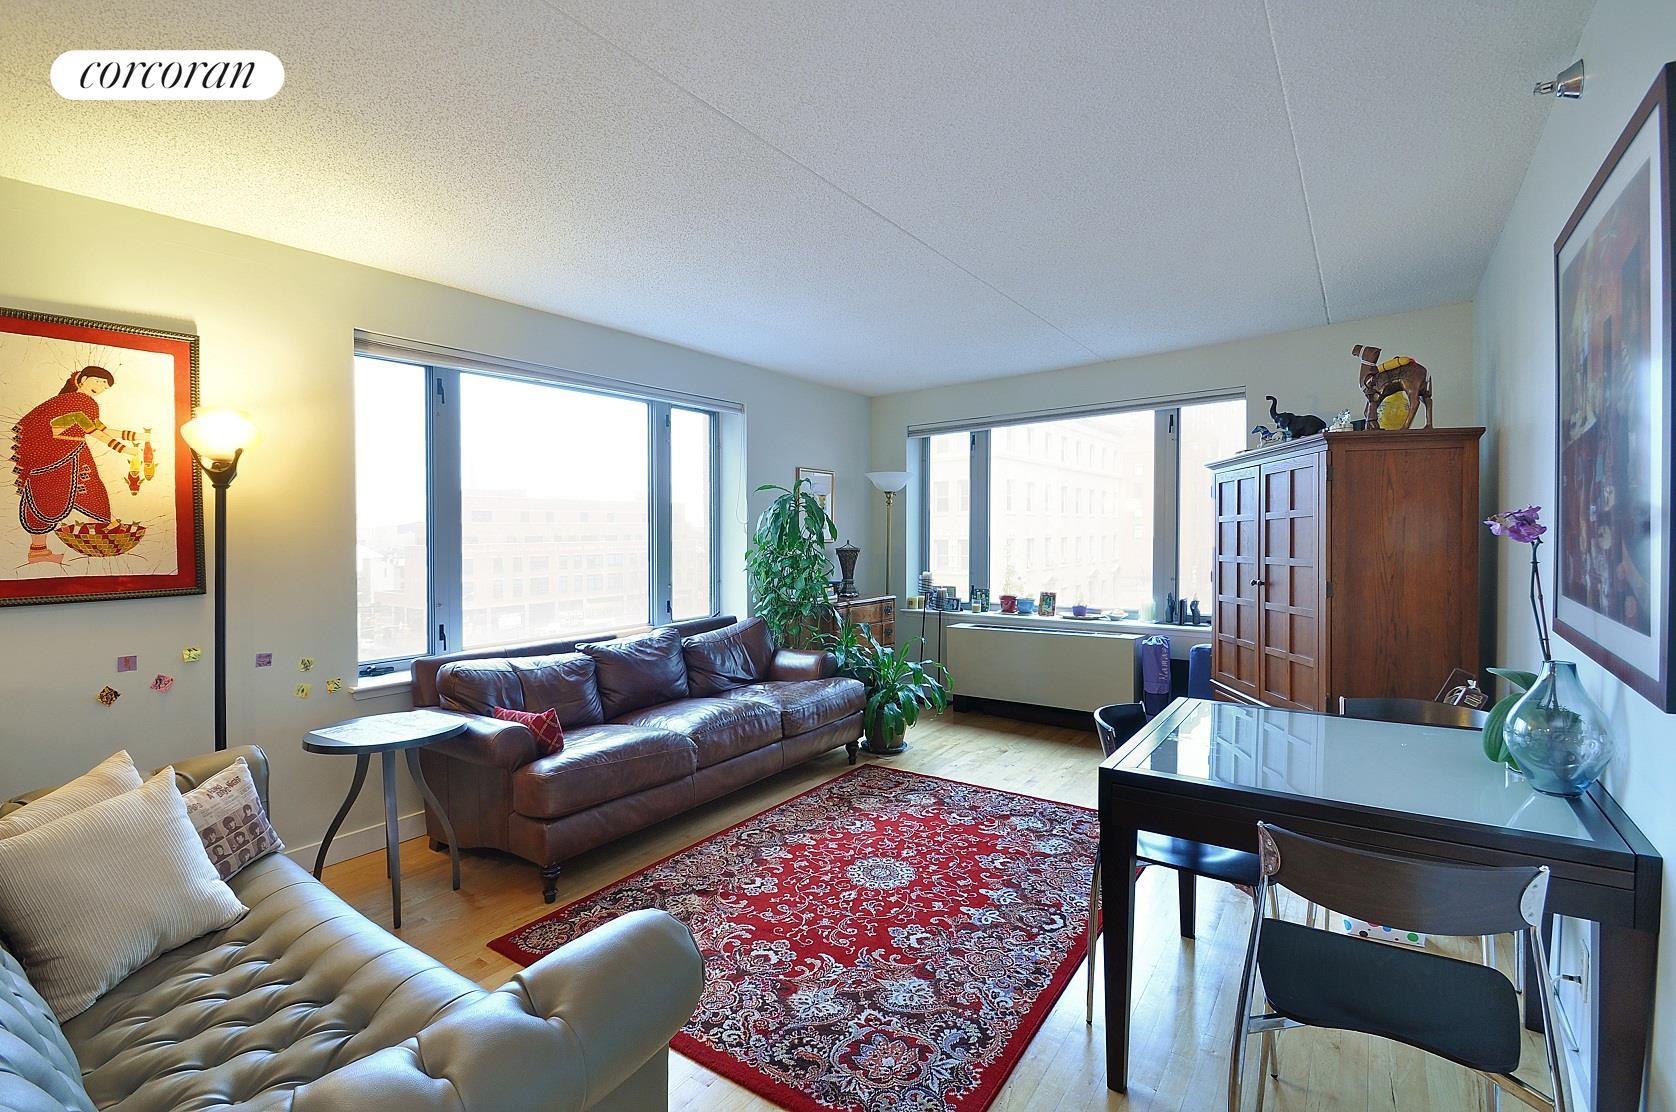 53 Boerum Place, #6F Photo 0 - CORCORAN-2563365